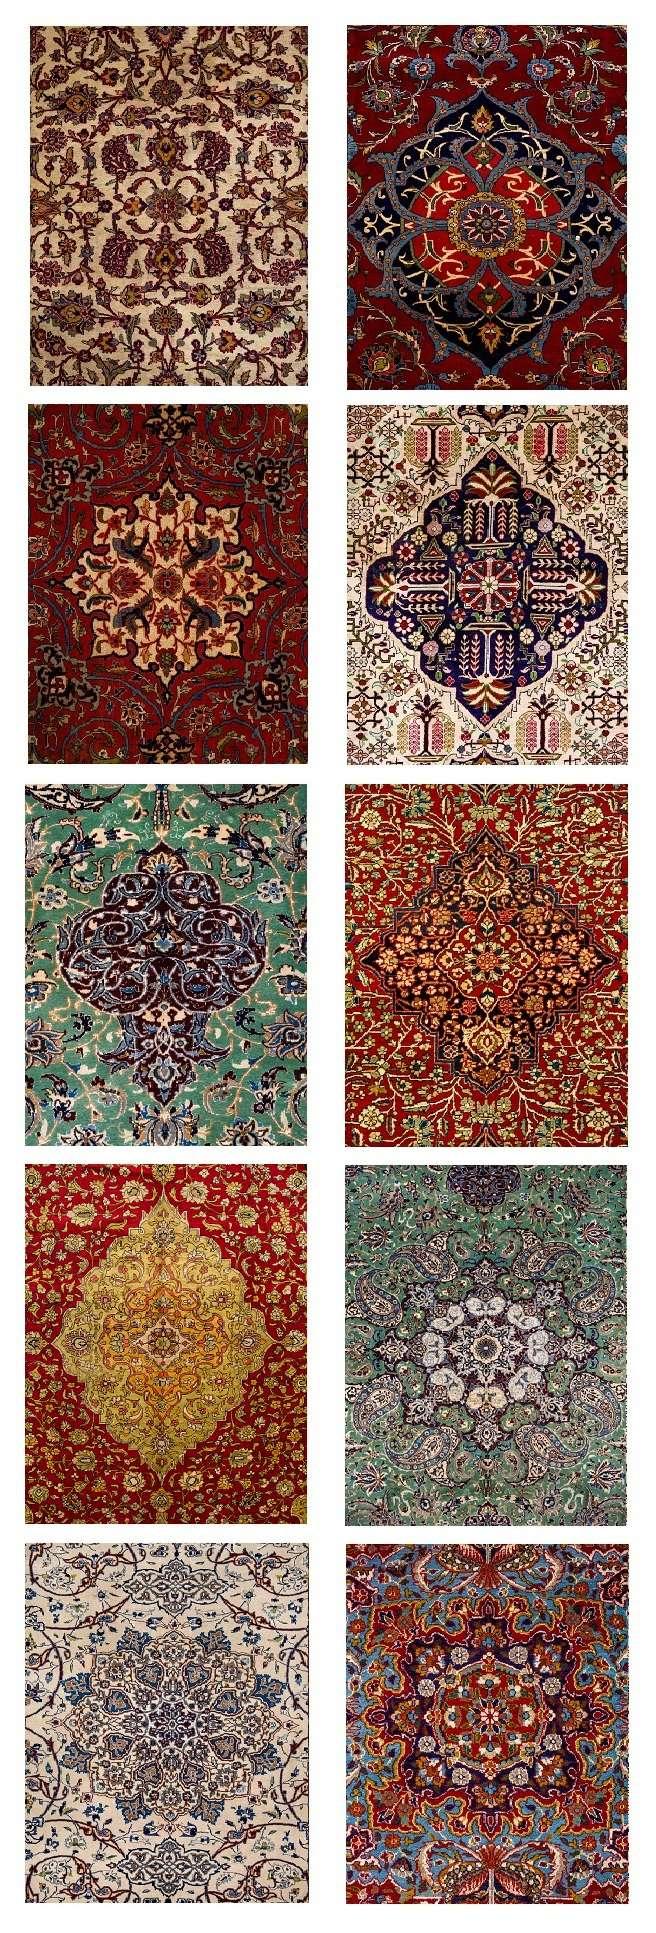 Articles Ornamentum Fine Antique Persian Rugs Amp Carpets